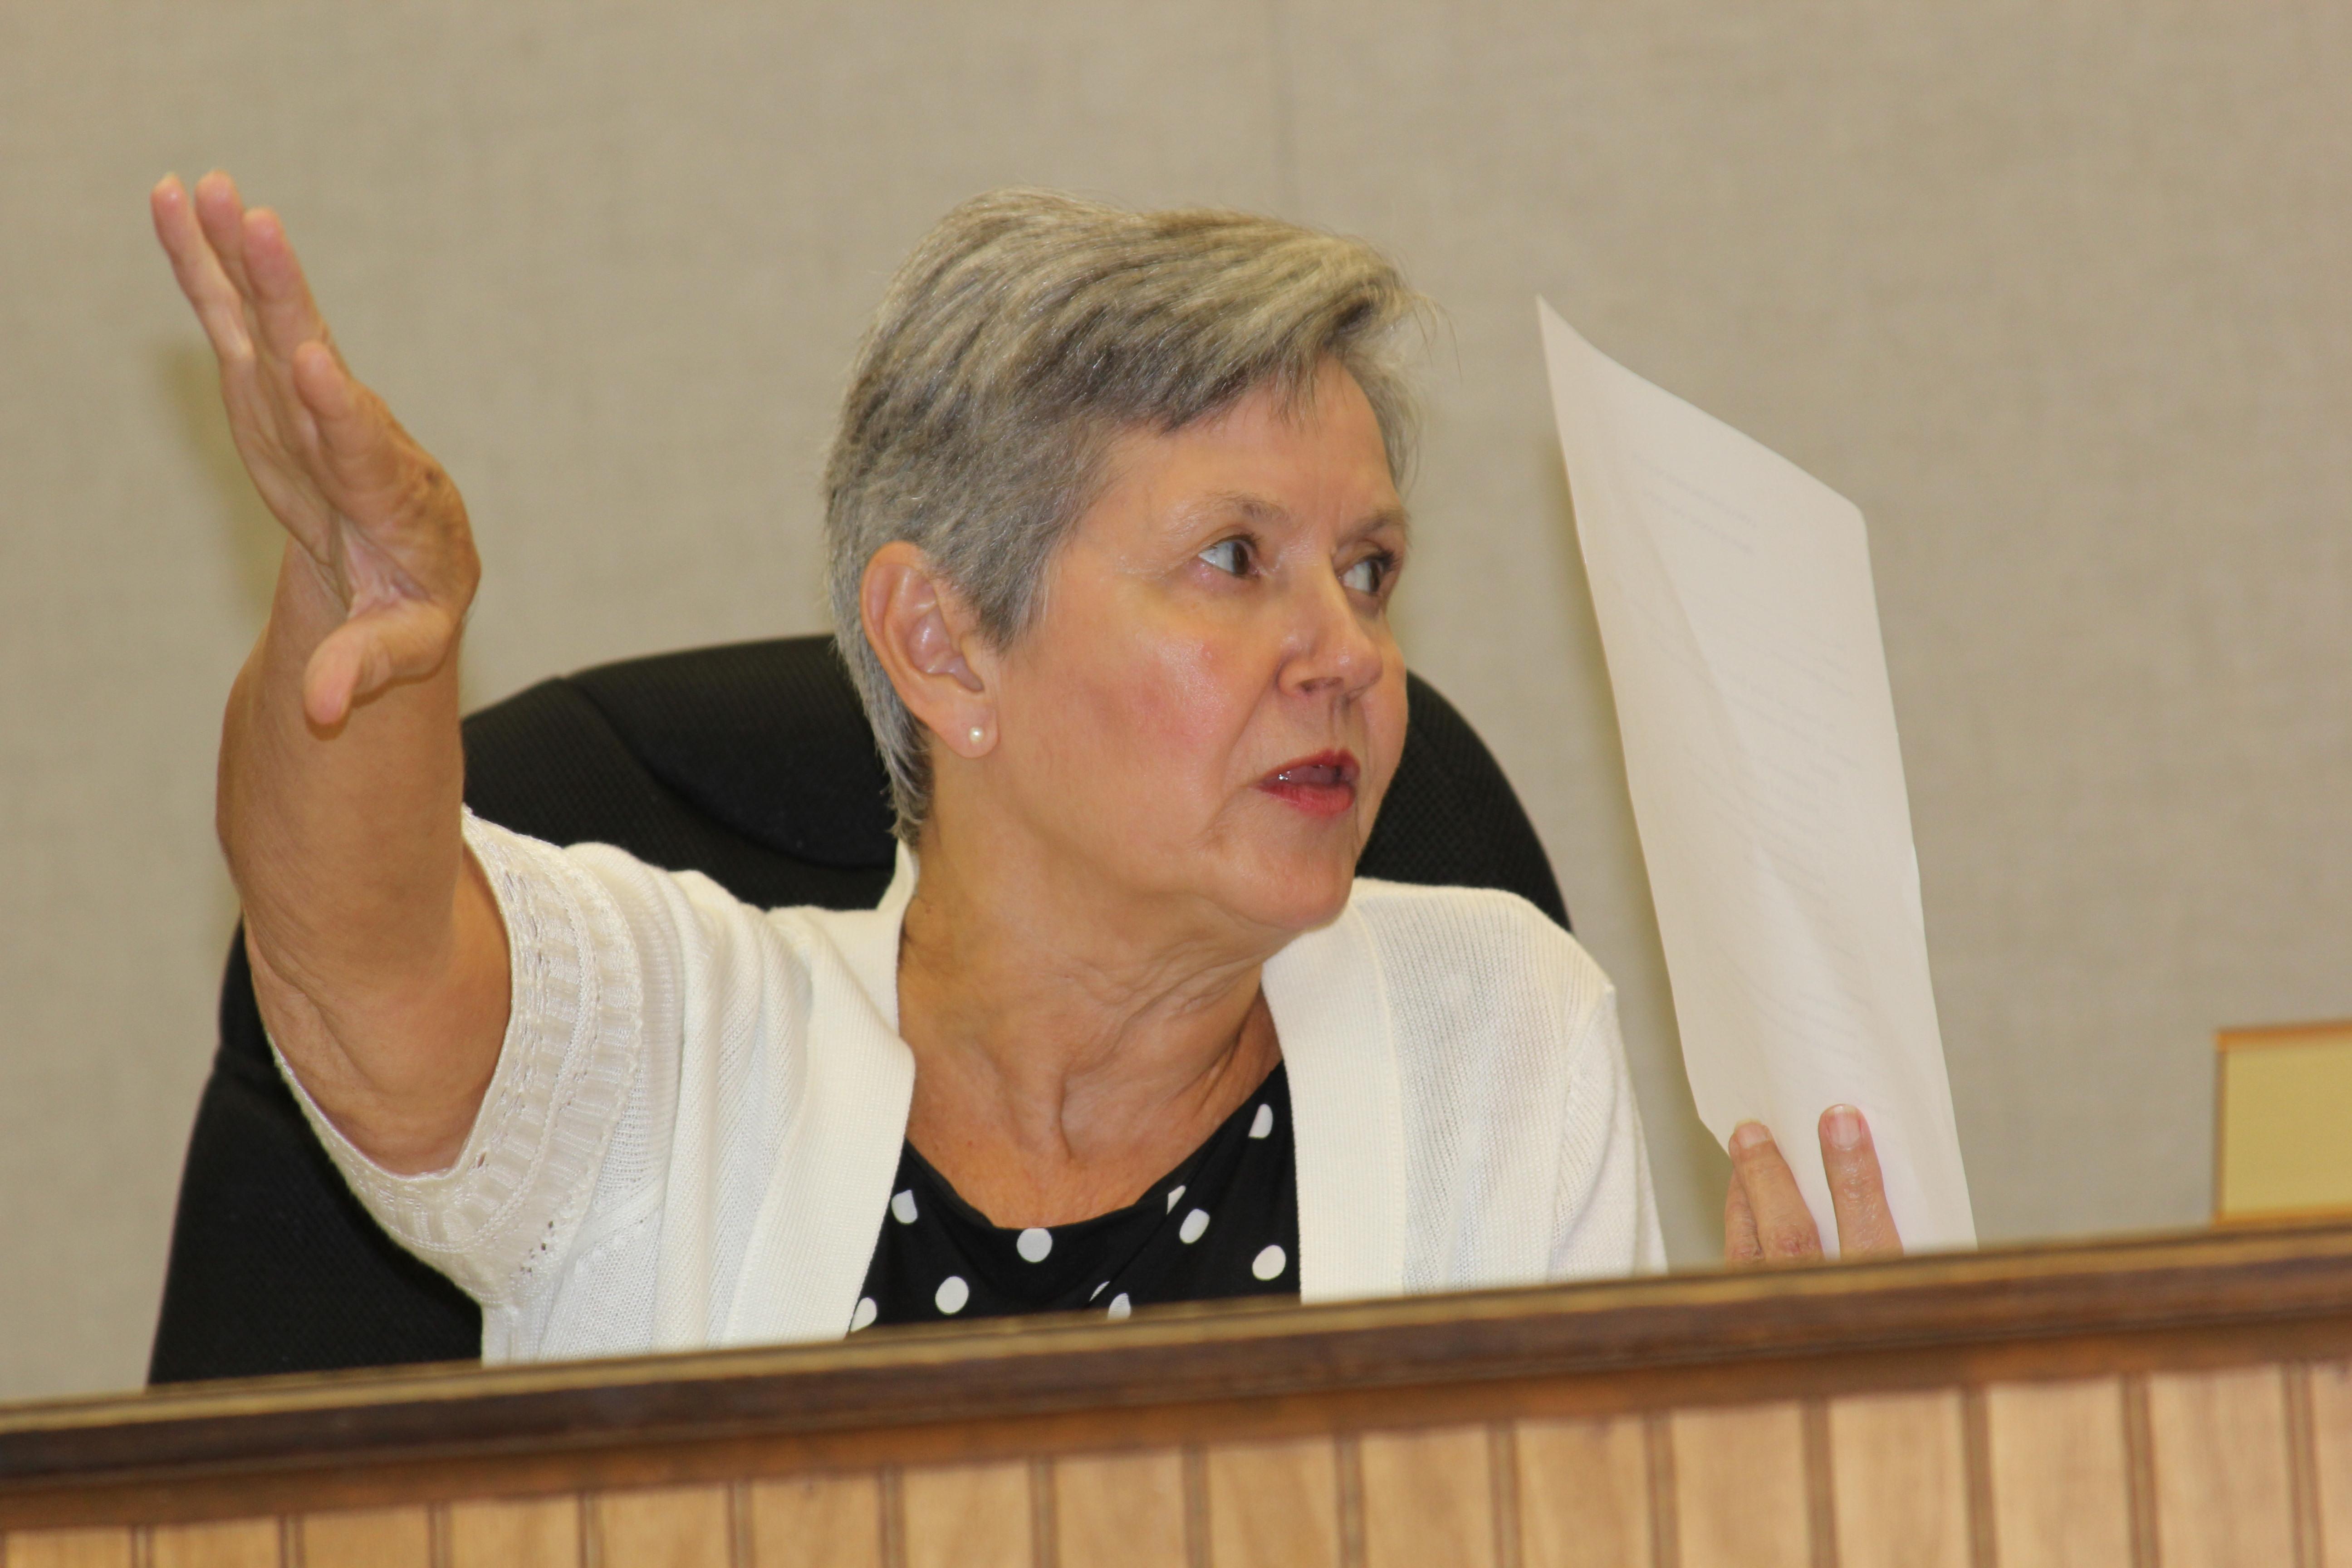 Trussville officials discuss annexation policies